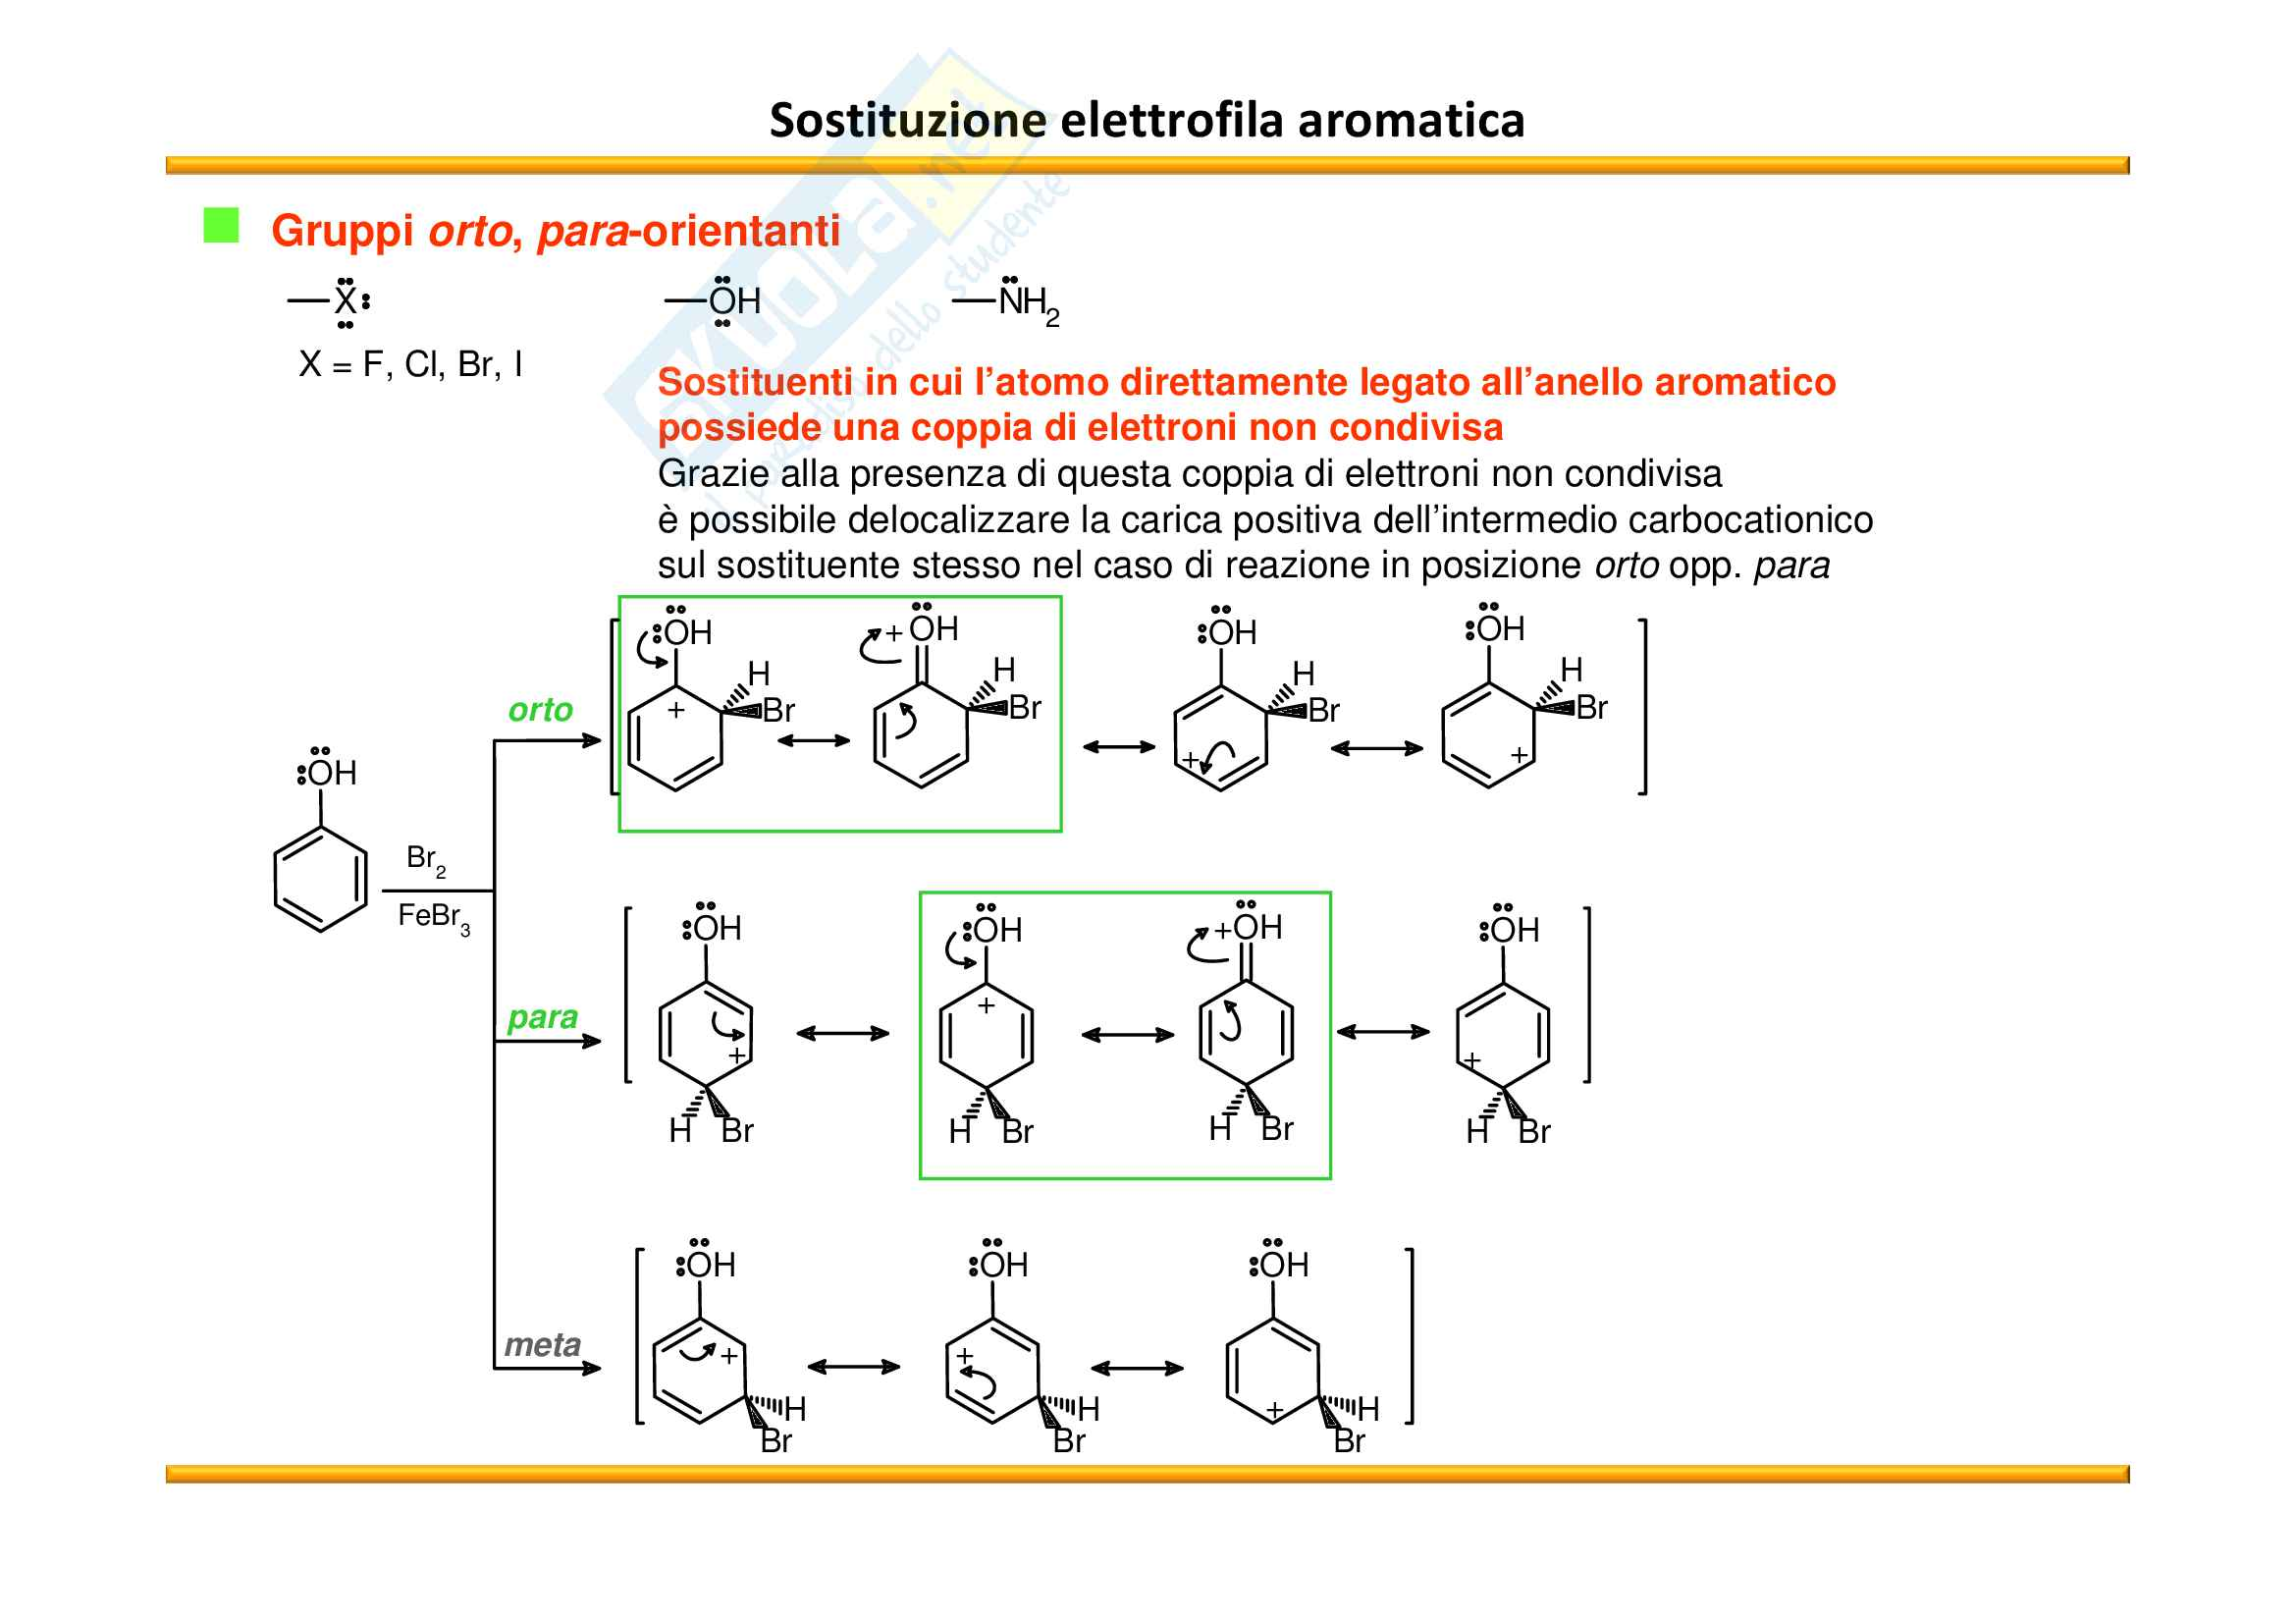 Chimica Organica: Composti aromatici Pag. 51